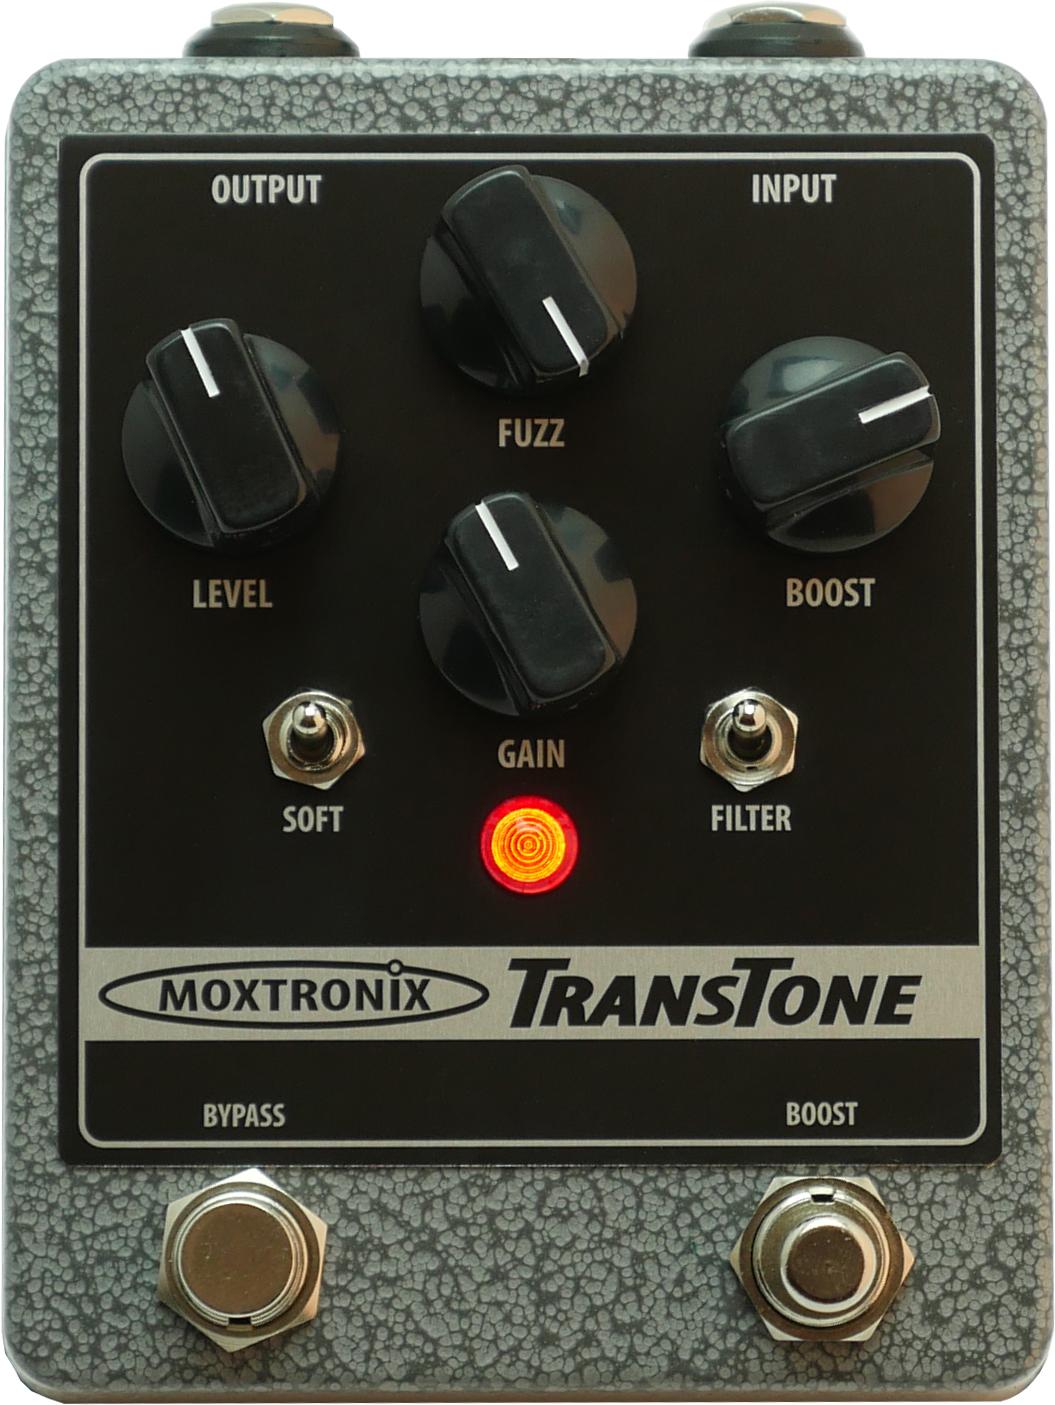 TransTone.jpg